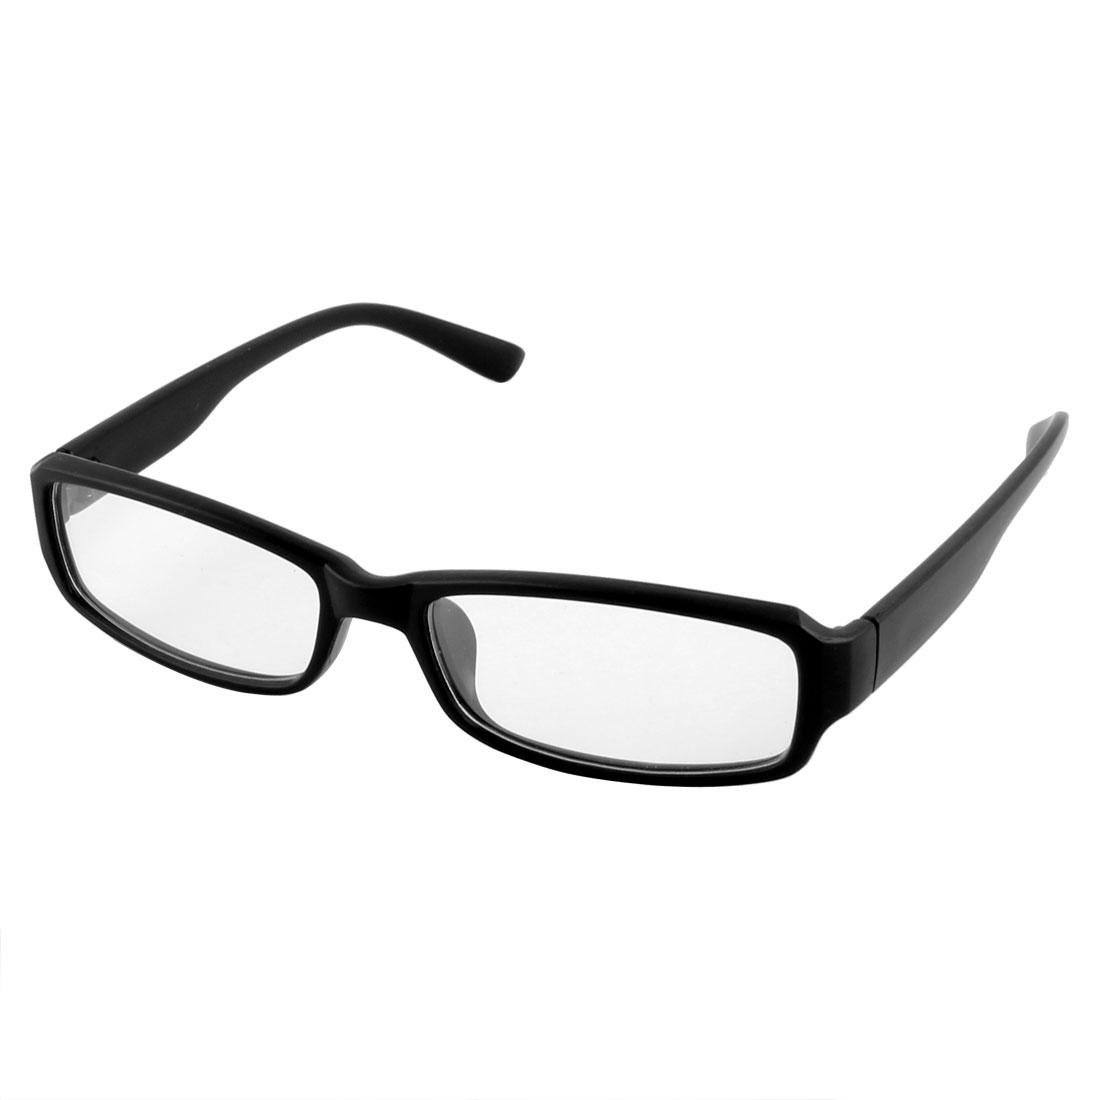 Home Writing Outdoor Unisex Plastic Rectangle Shaped Single Bridge Plain Glasses Black